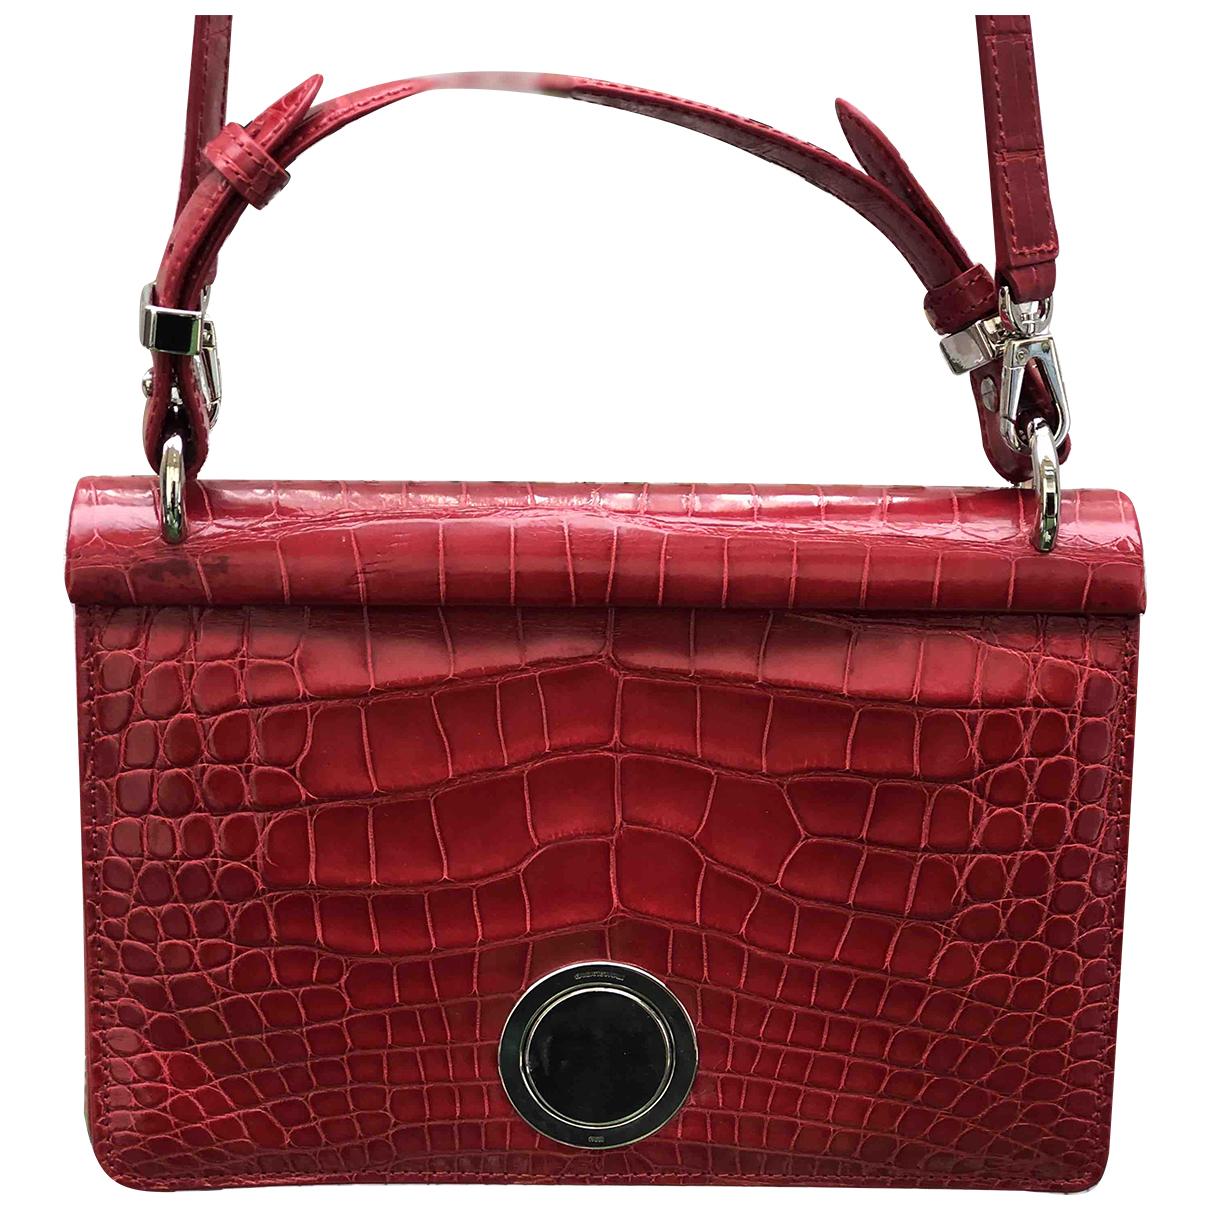 Giambattista Valli N Red Crocodile handbag for Women N